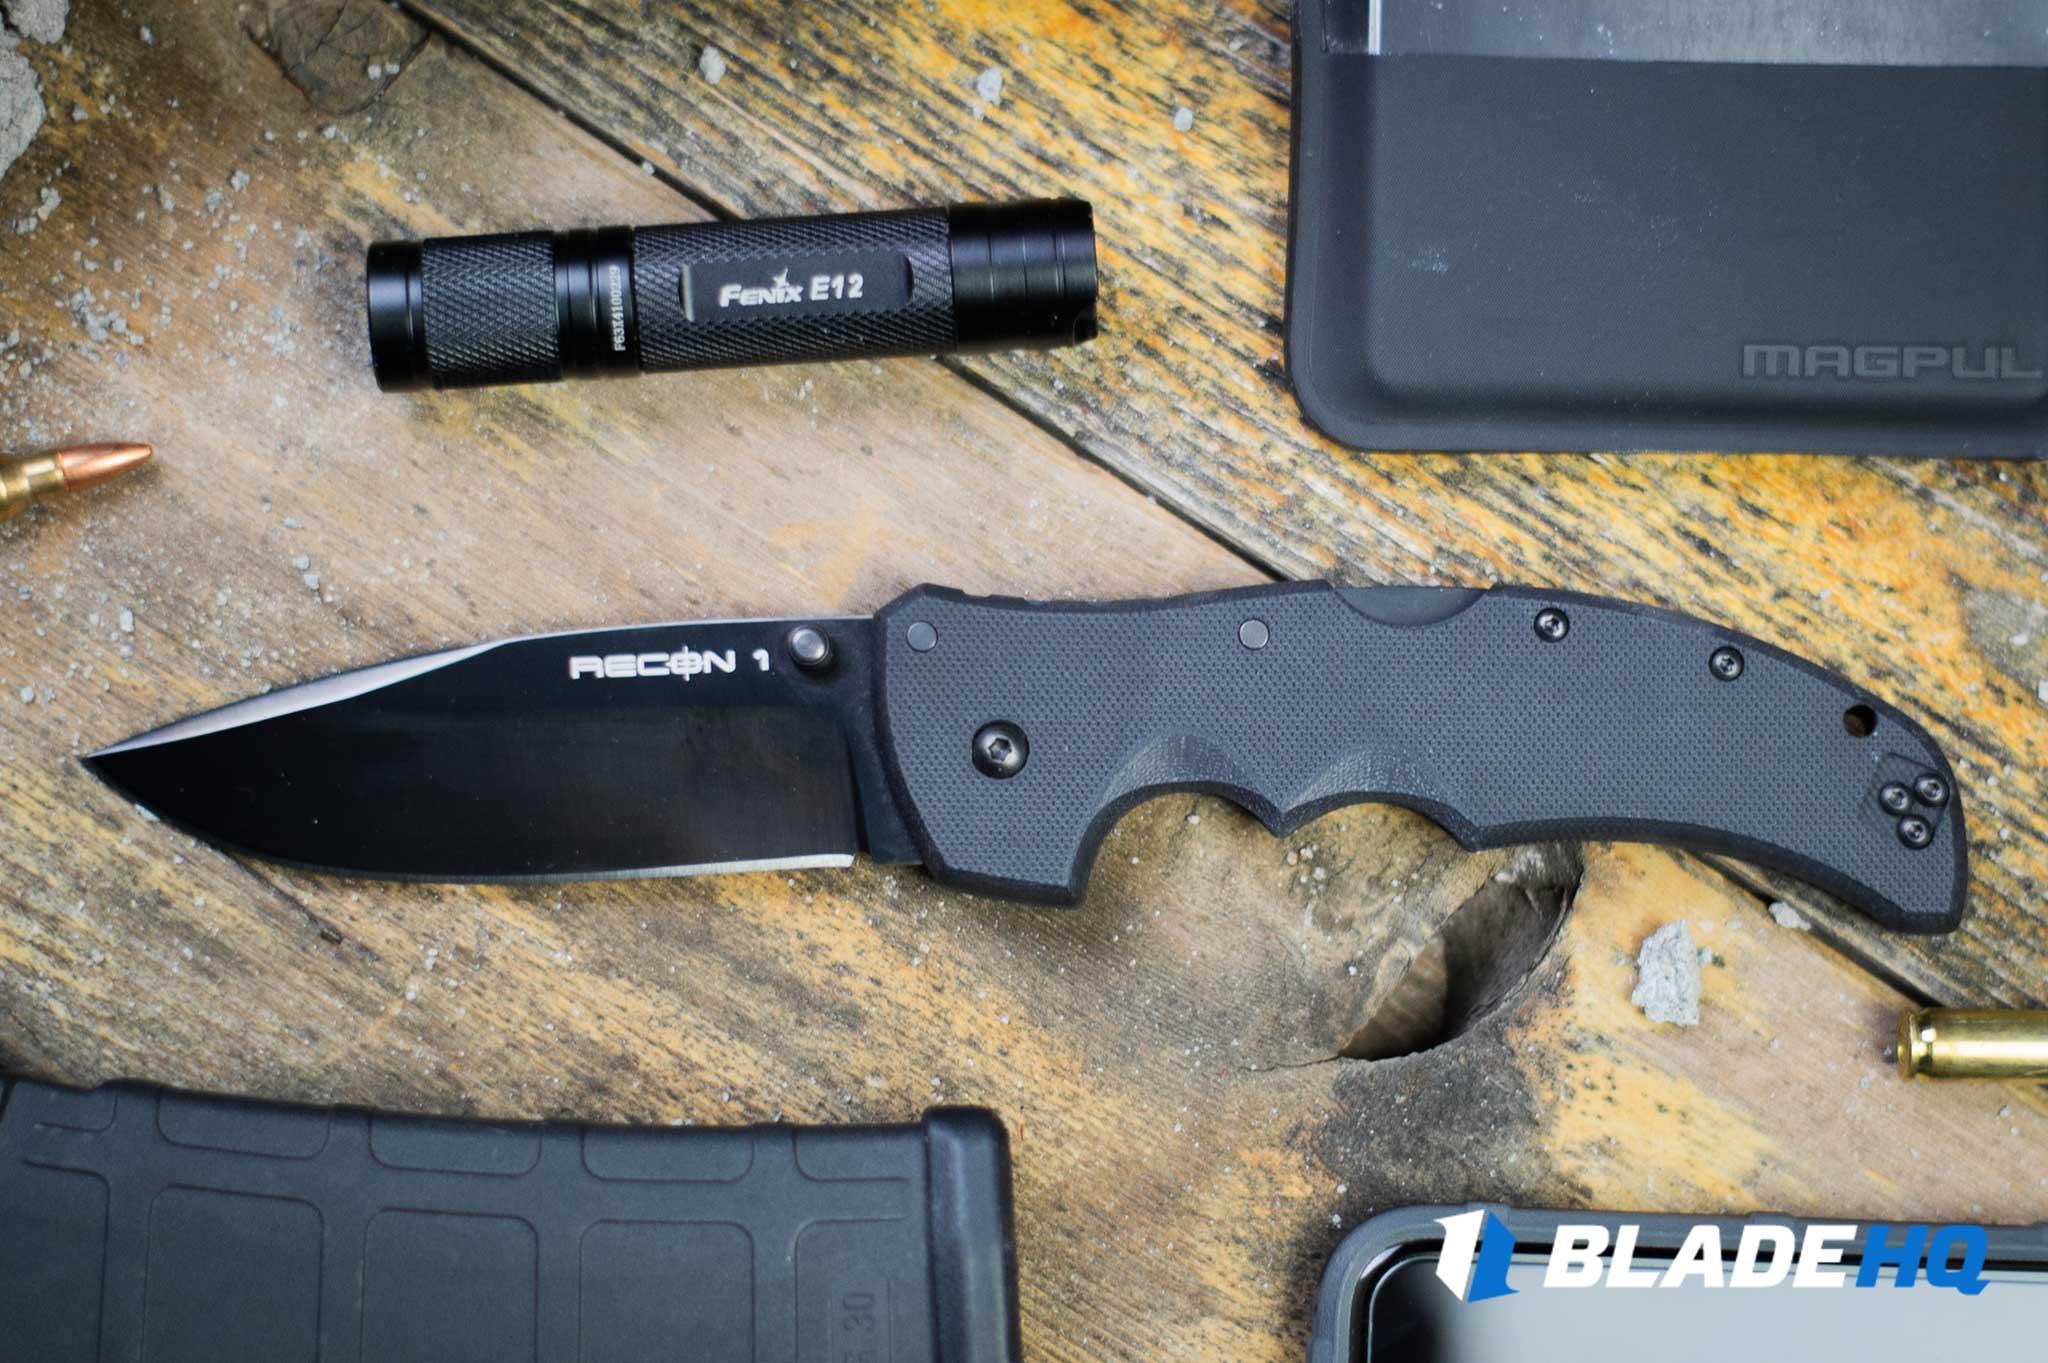 Cold Steel Recon 1 Knife Ergonomics